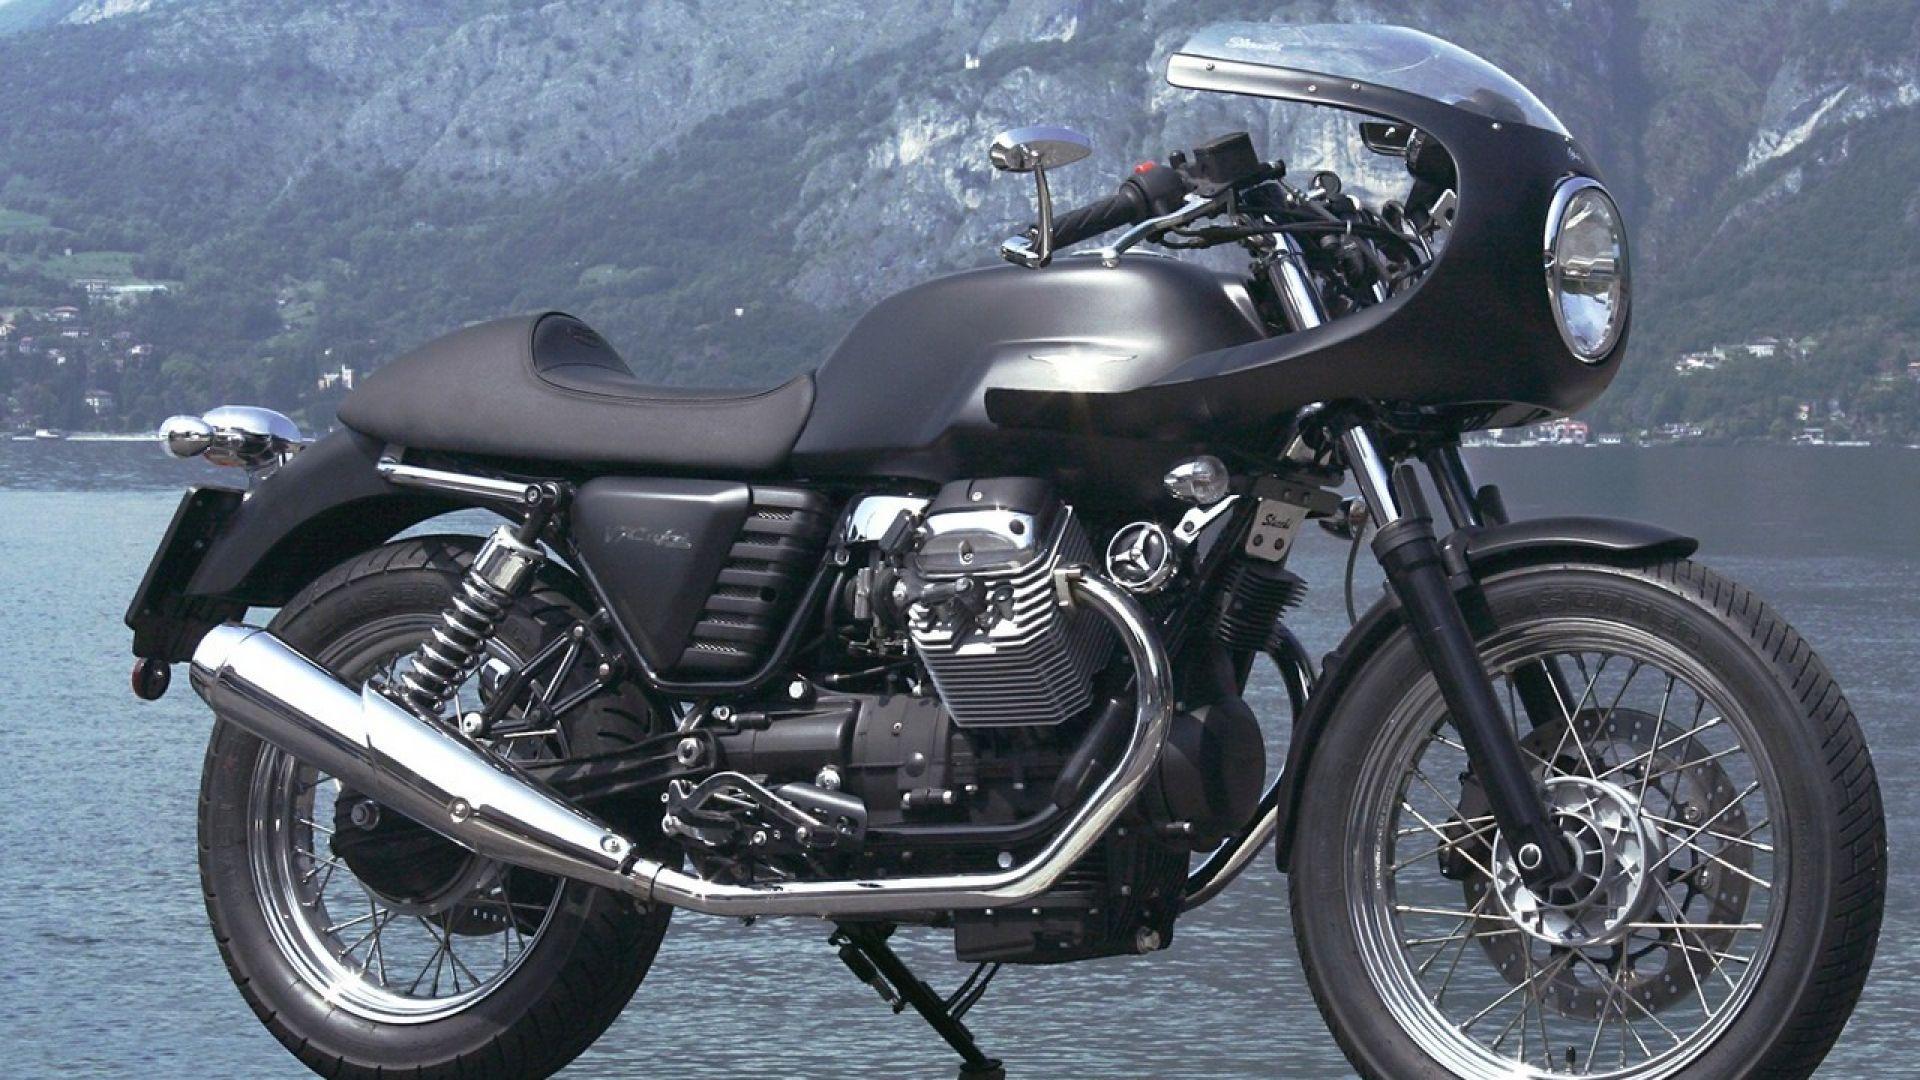 Immagine 0: Moto Guzzi V7 Café Racer